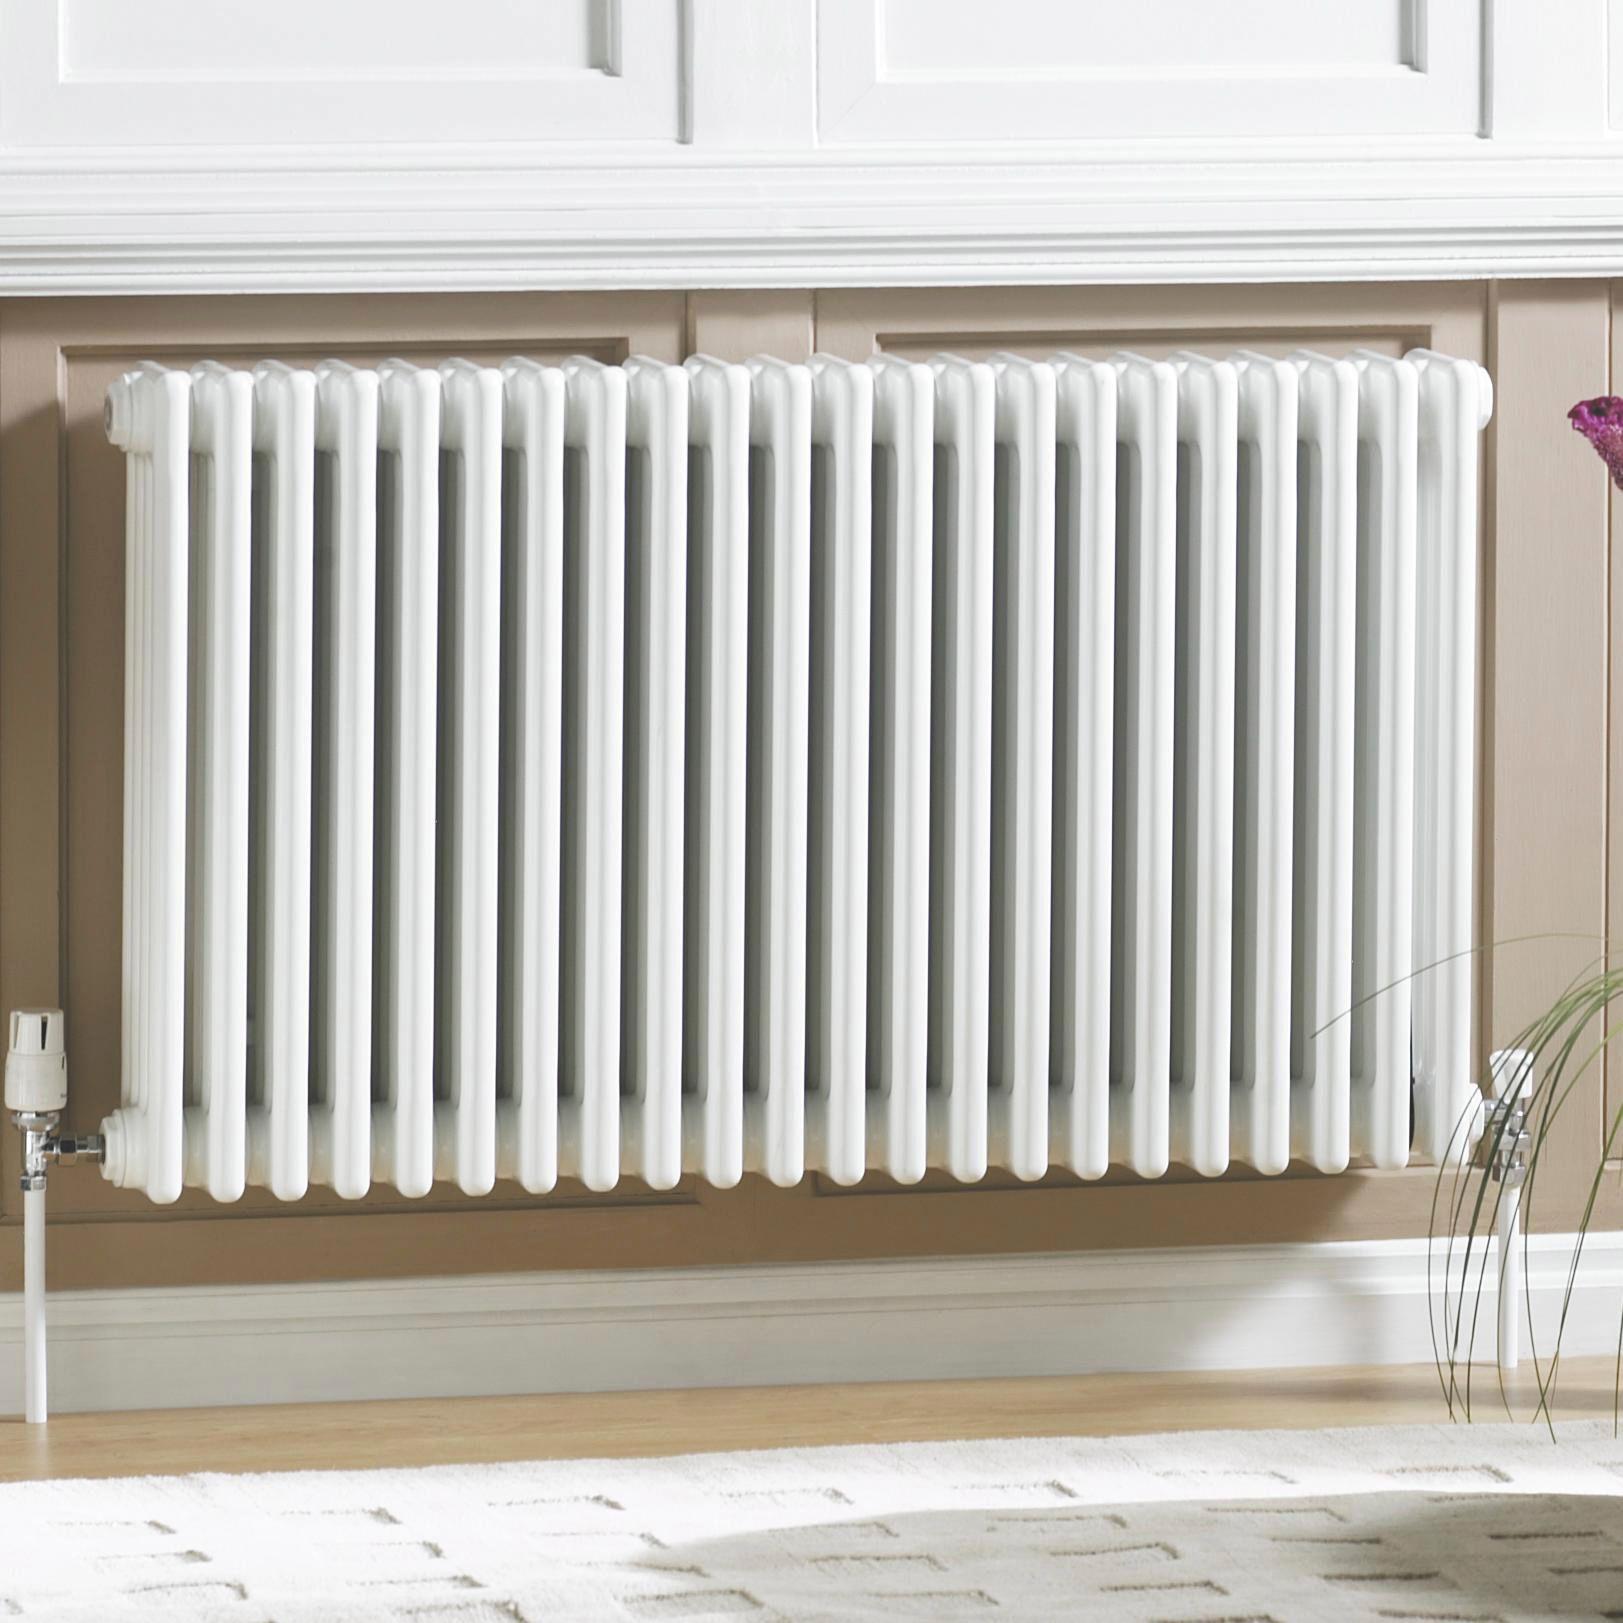 Acova 2 Column radiator, White (W)1226mm (H)600mm